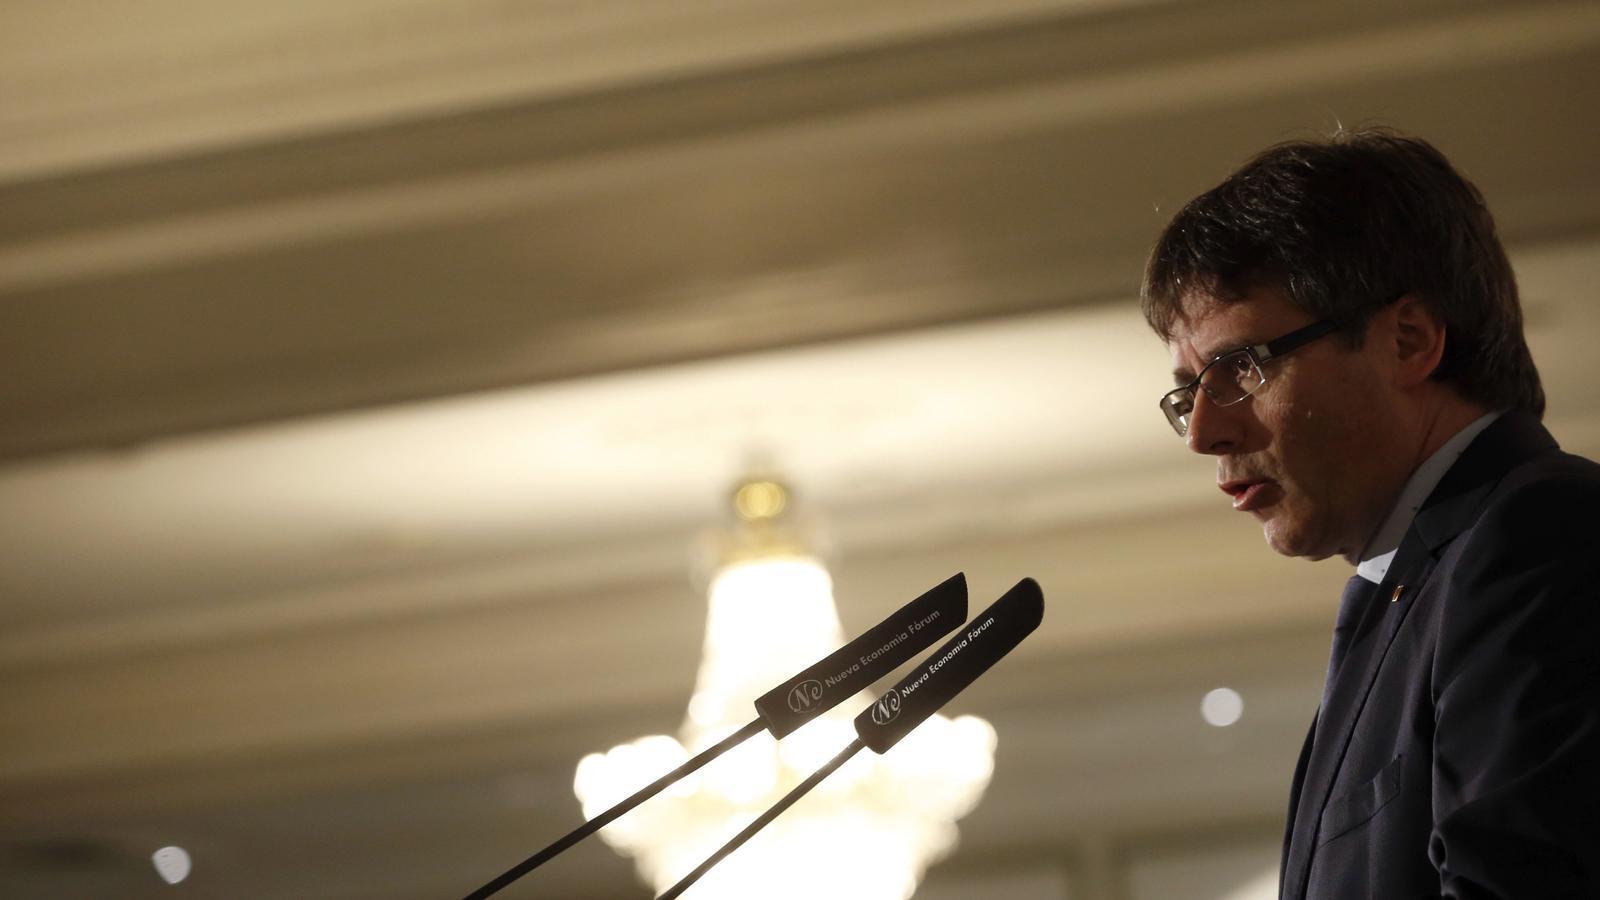 La conferència de Puigdemont a Madrid, en directe